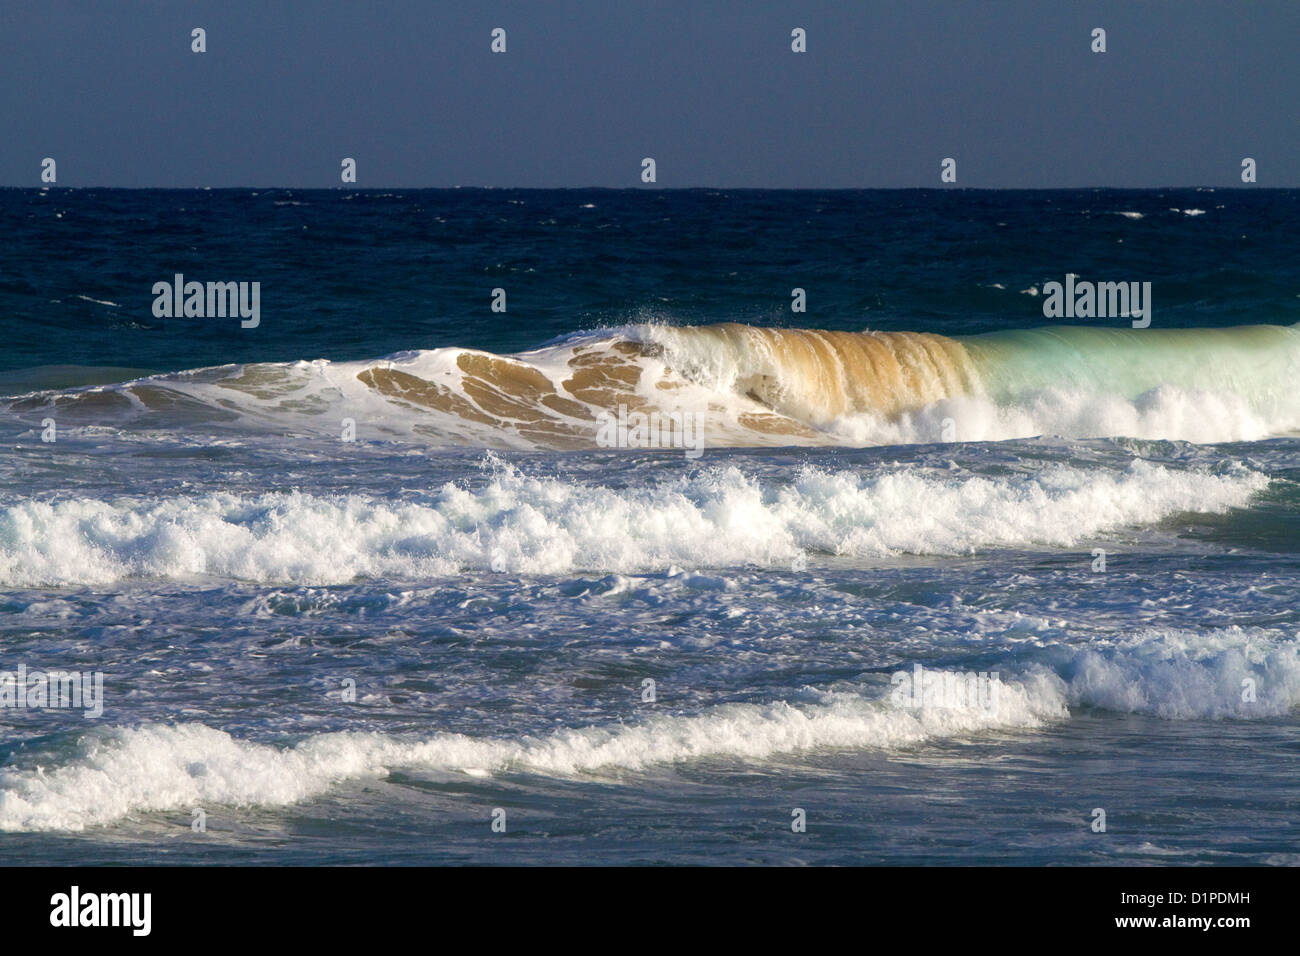 Pacific ocean waves off the island coast of Kauai, Hawaii, USA. Stock Photo